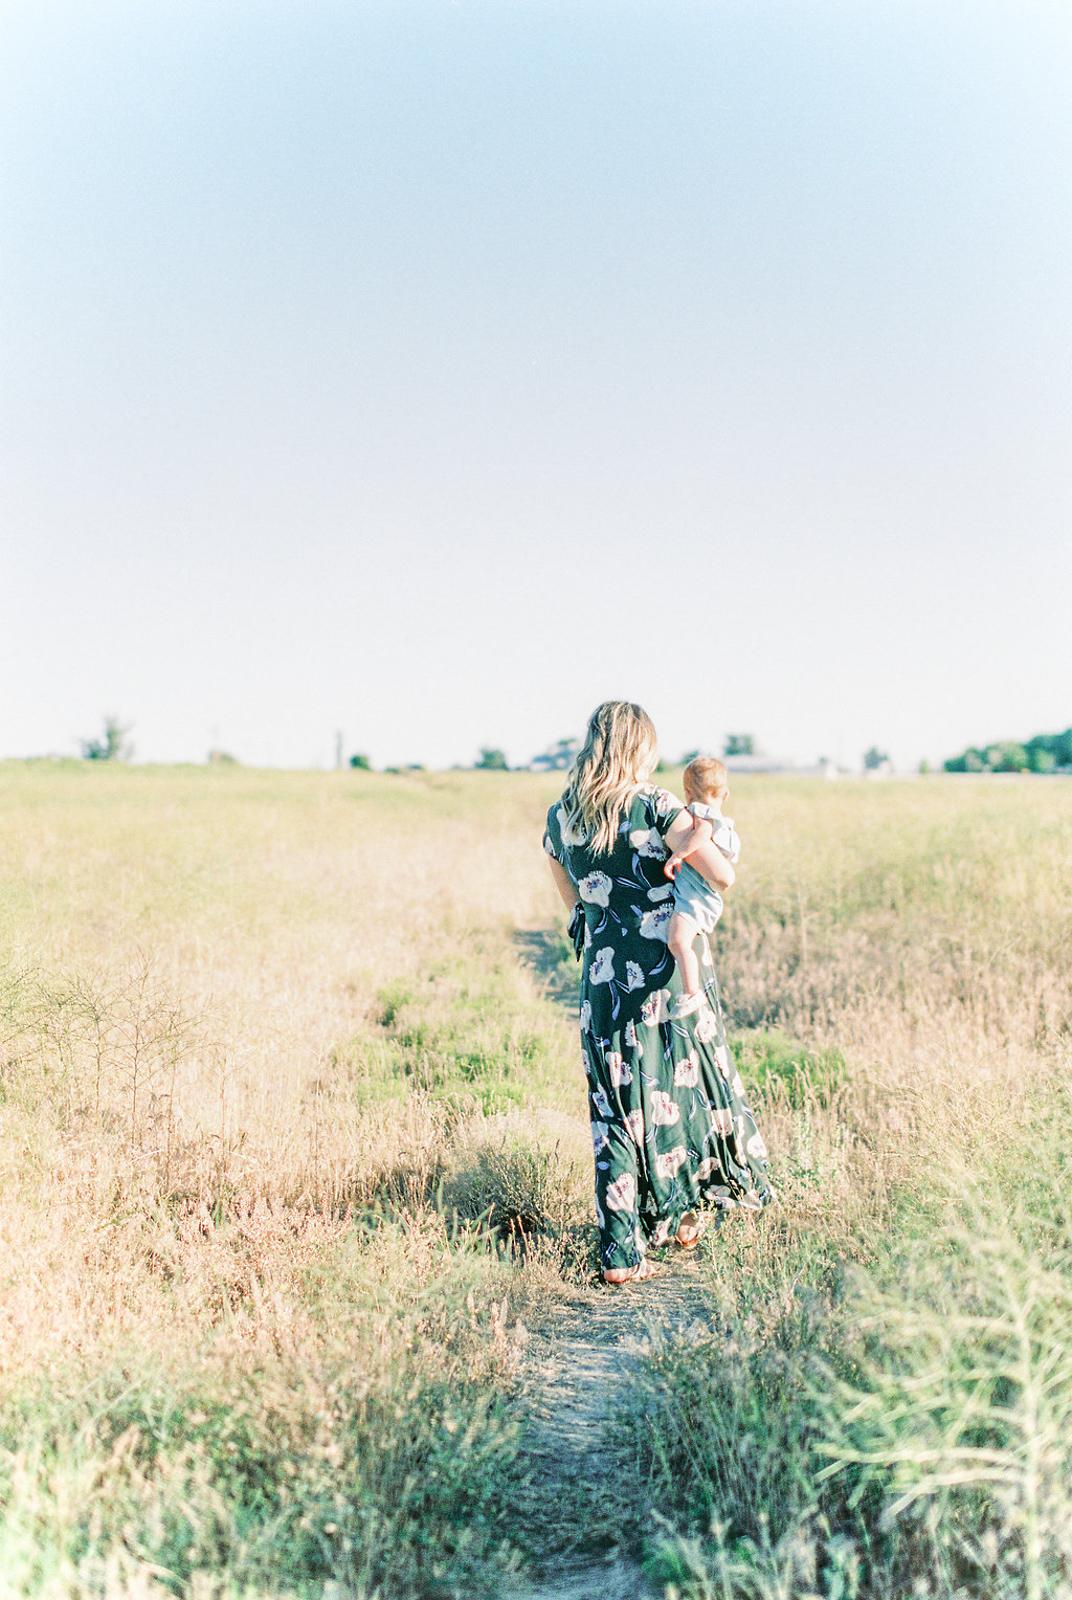 boise-idaho-family-film-photographer-25.jpg